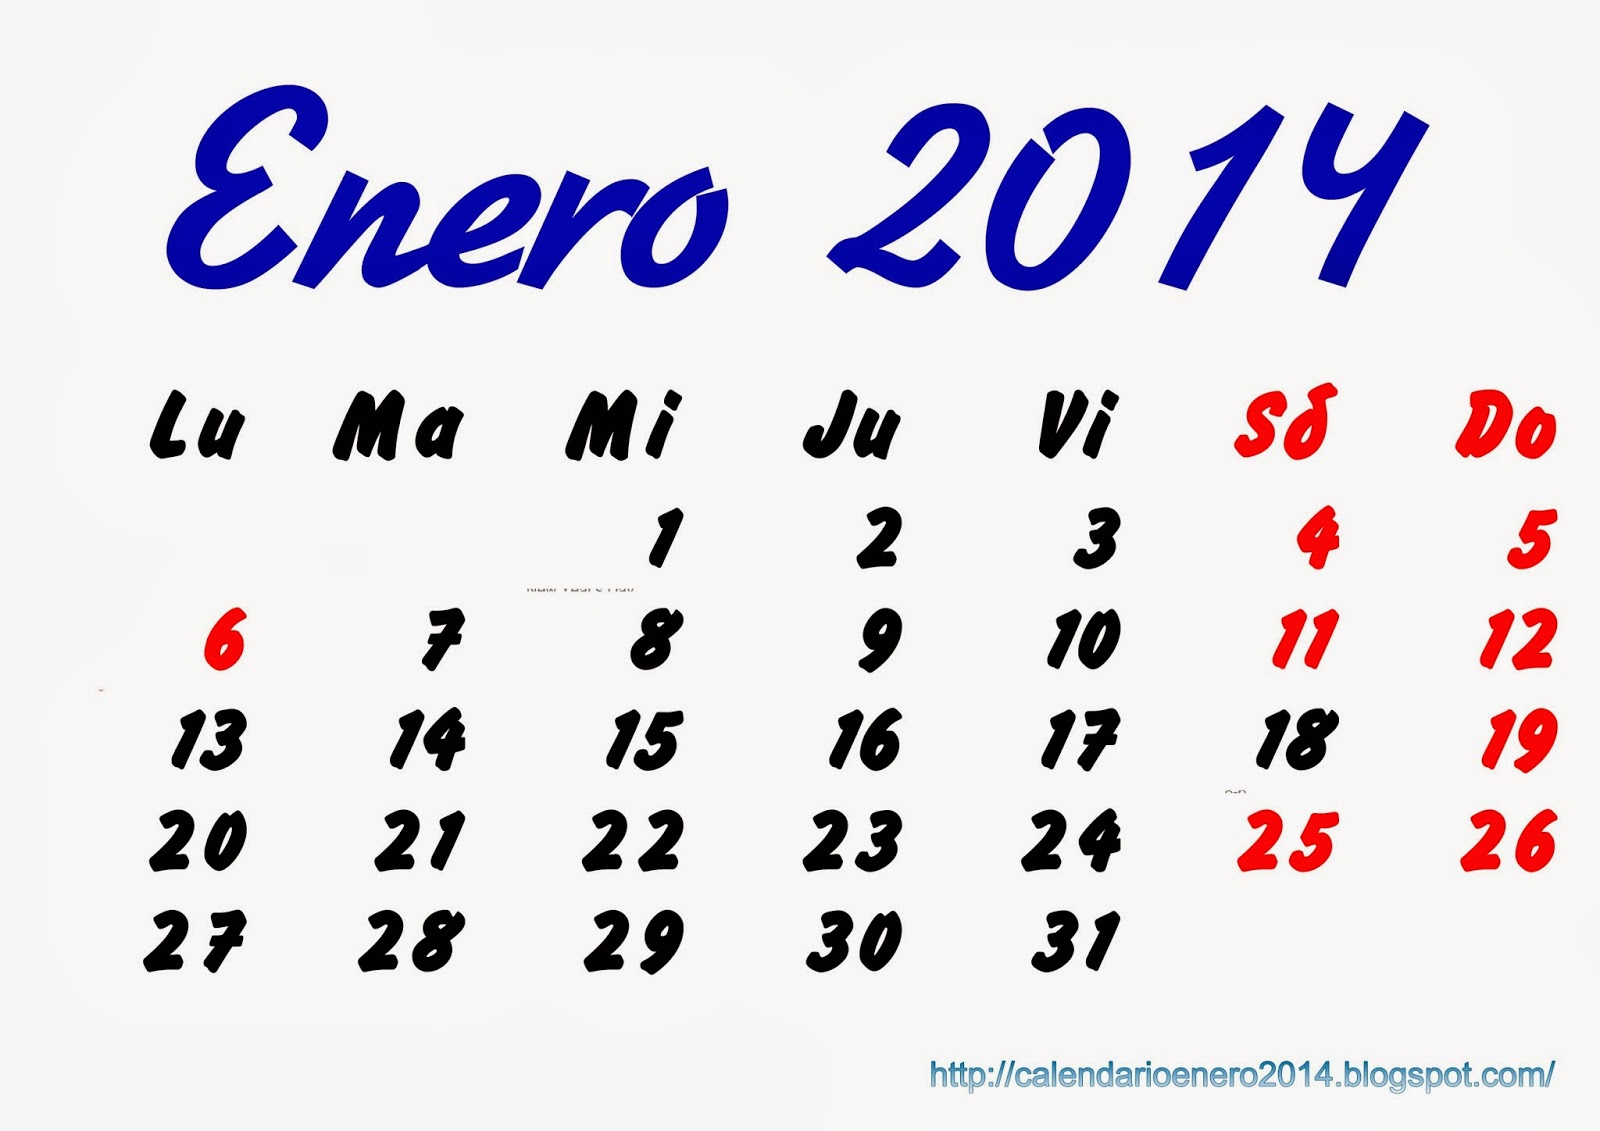 Calendario 2014 Gratis En Formato Word, PDF, Excel - Calendario Para ...